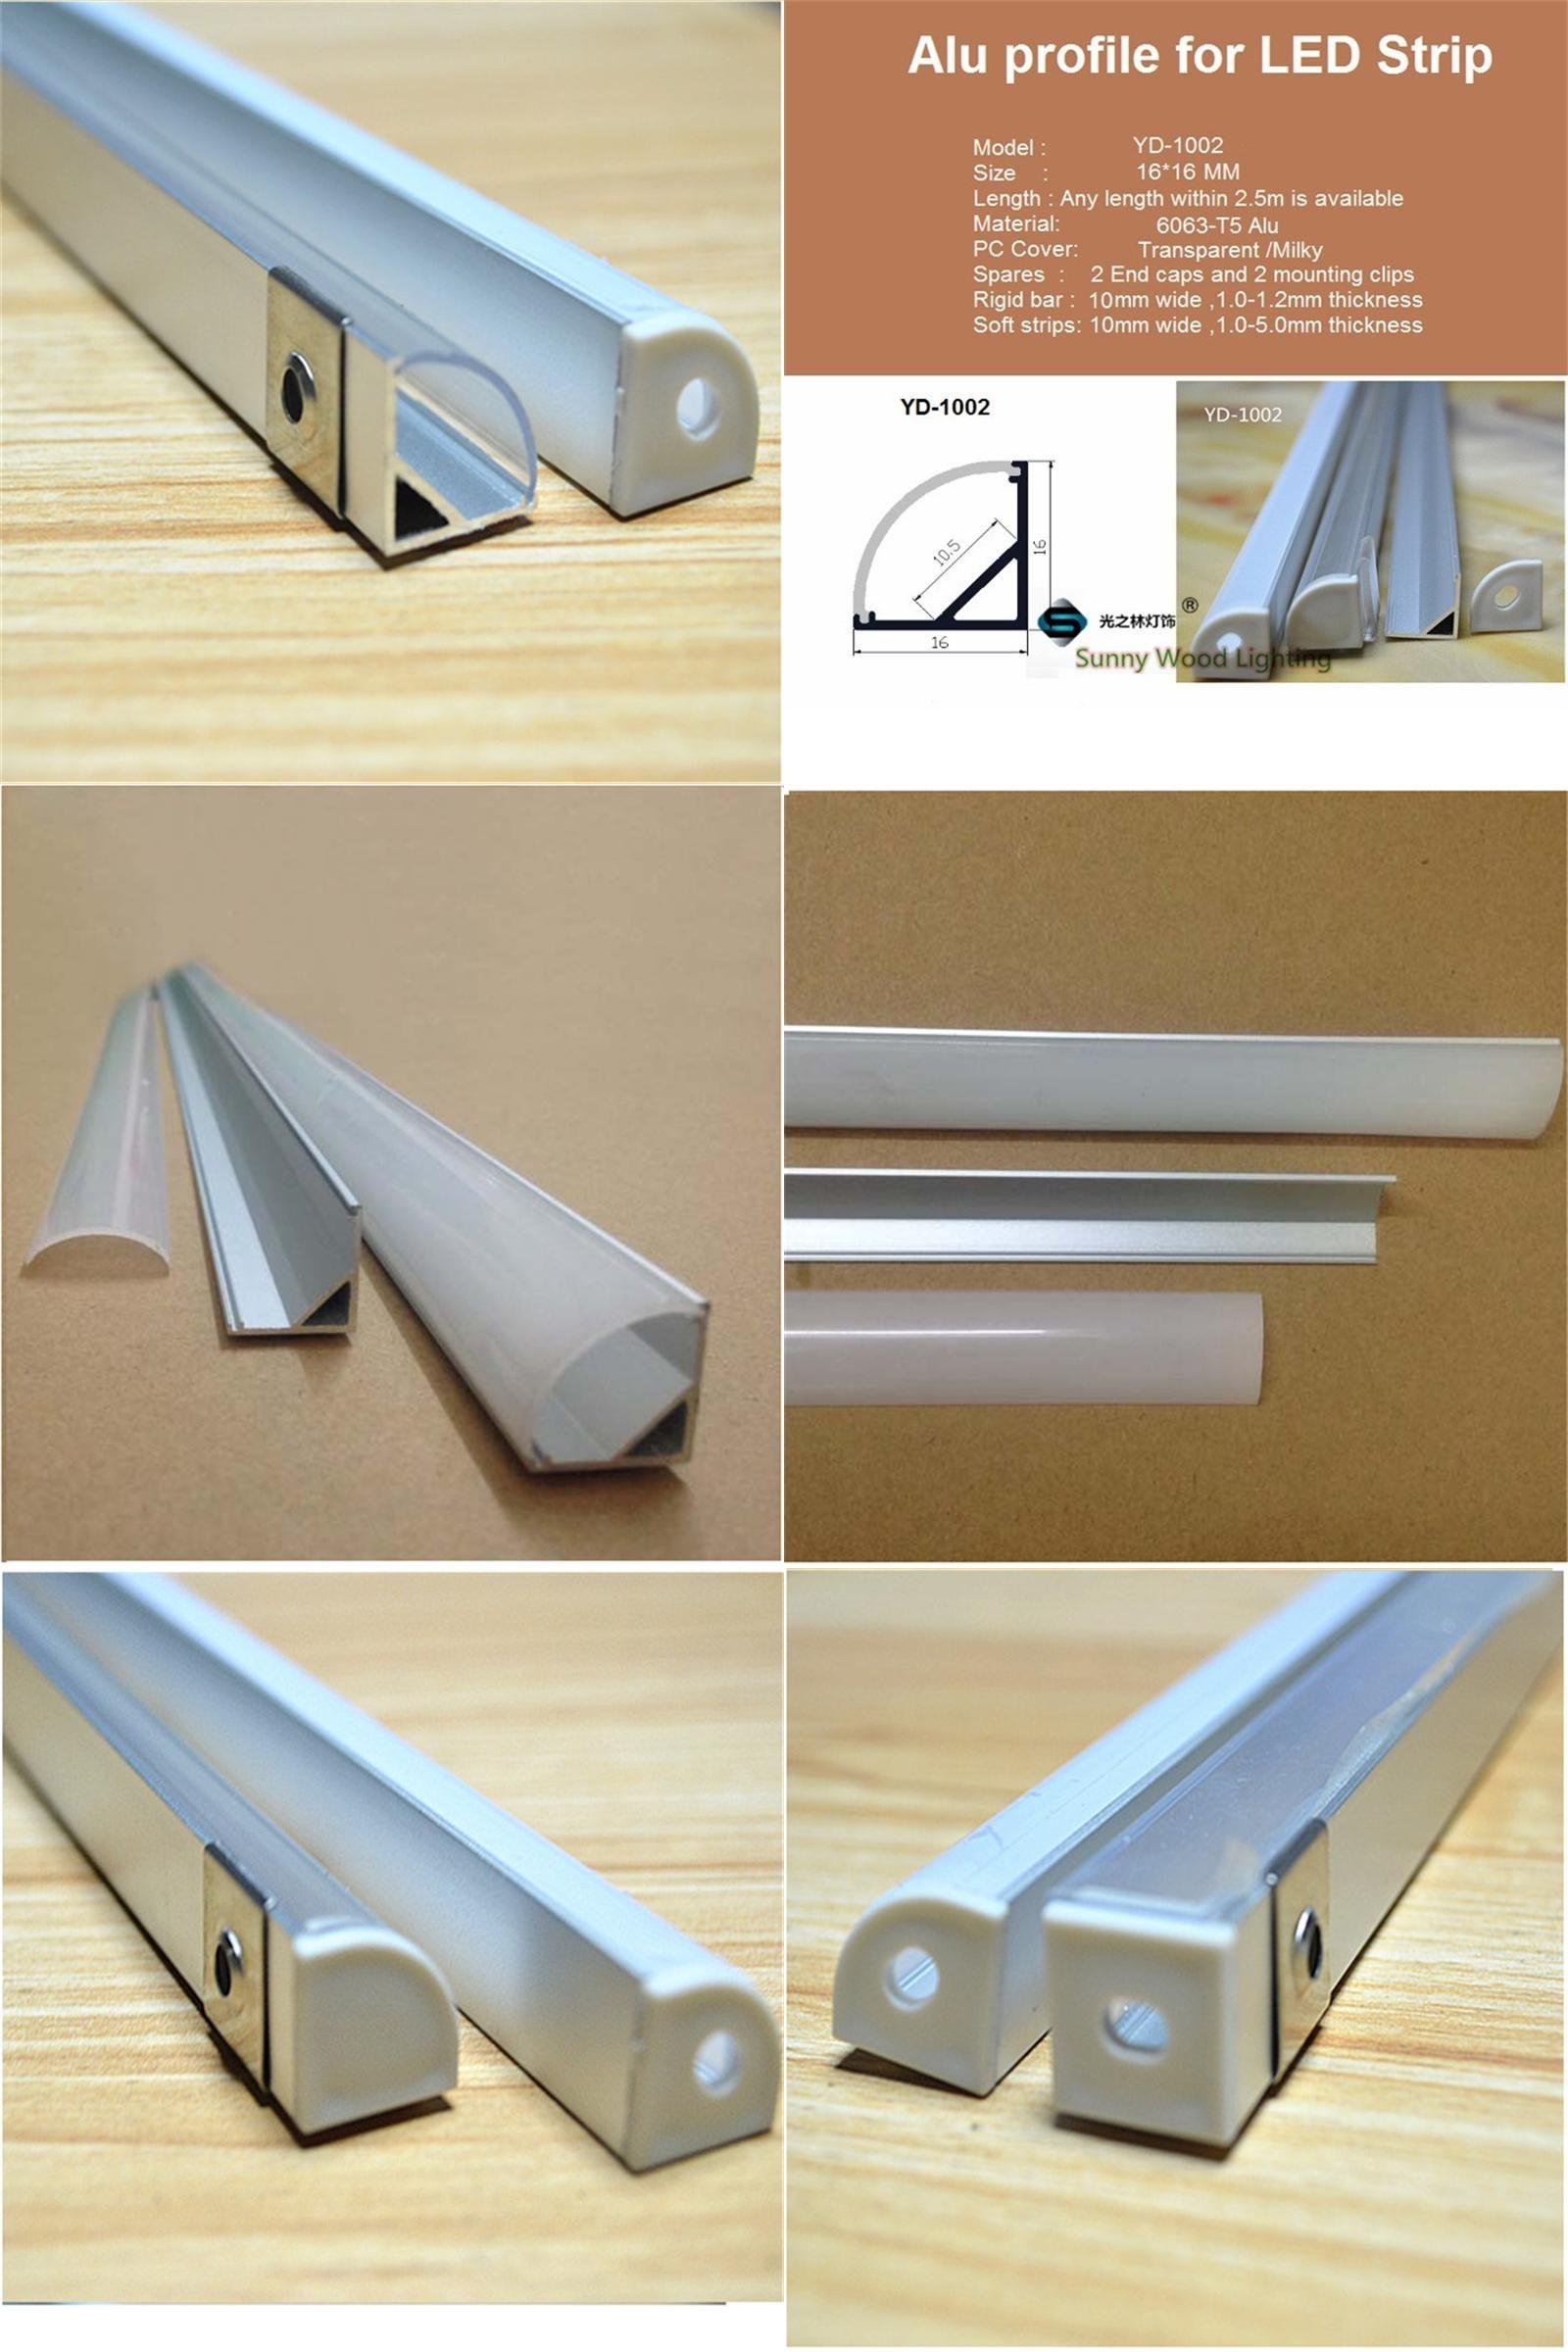 Visit To Buy 2 30pcs Lot 0 5m Pc 45 Degree Corner Aluminum Profile For 5050 3528 Led Strip Milky Transparent Cover For 10mm Pc Led Strip Home Led Light Bars